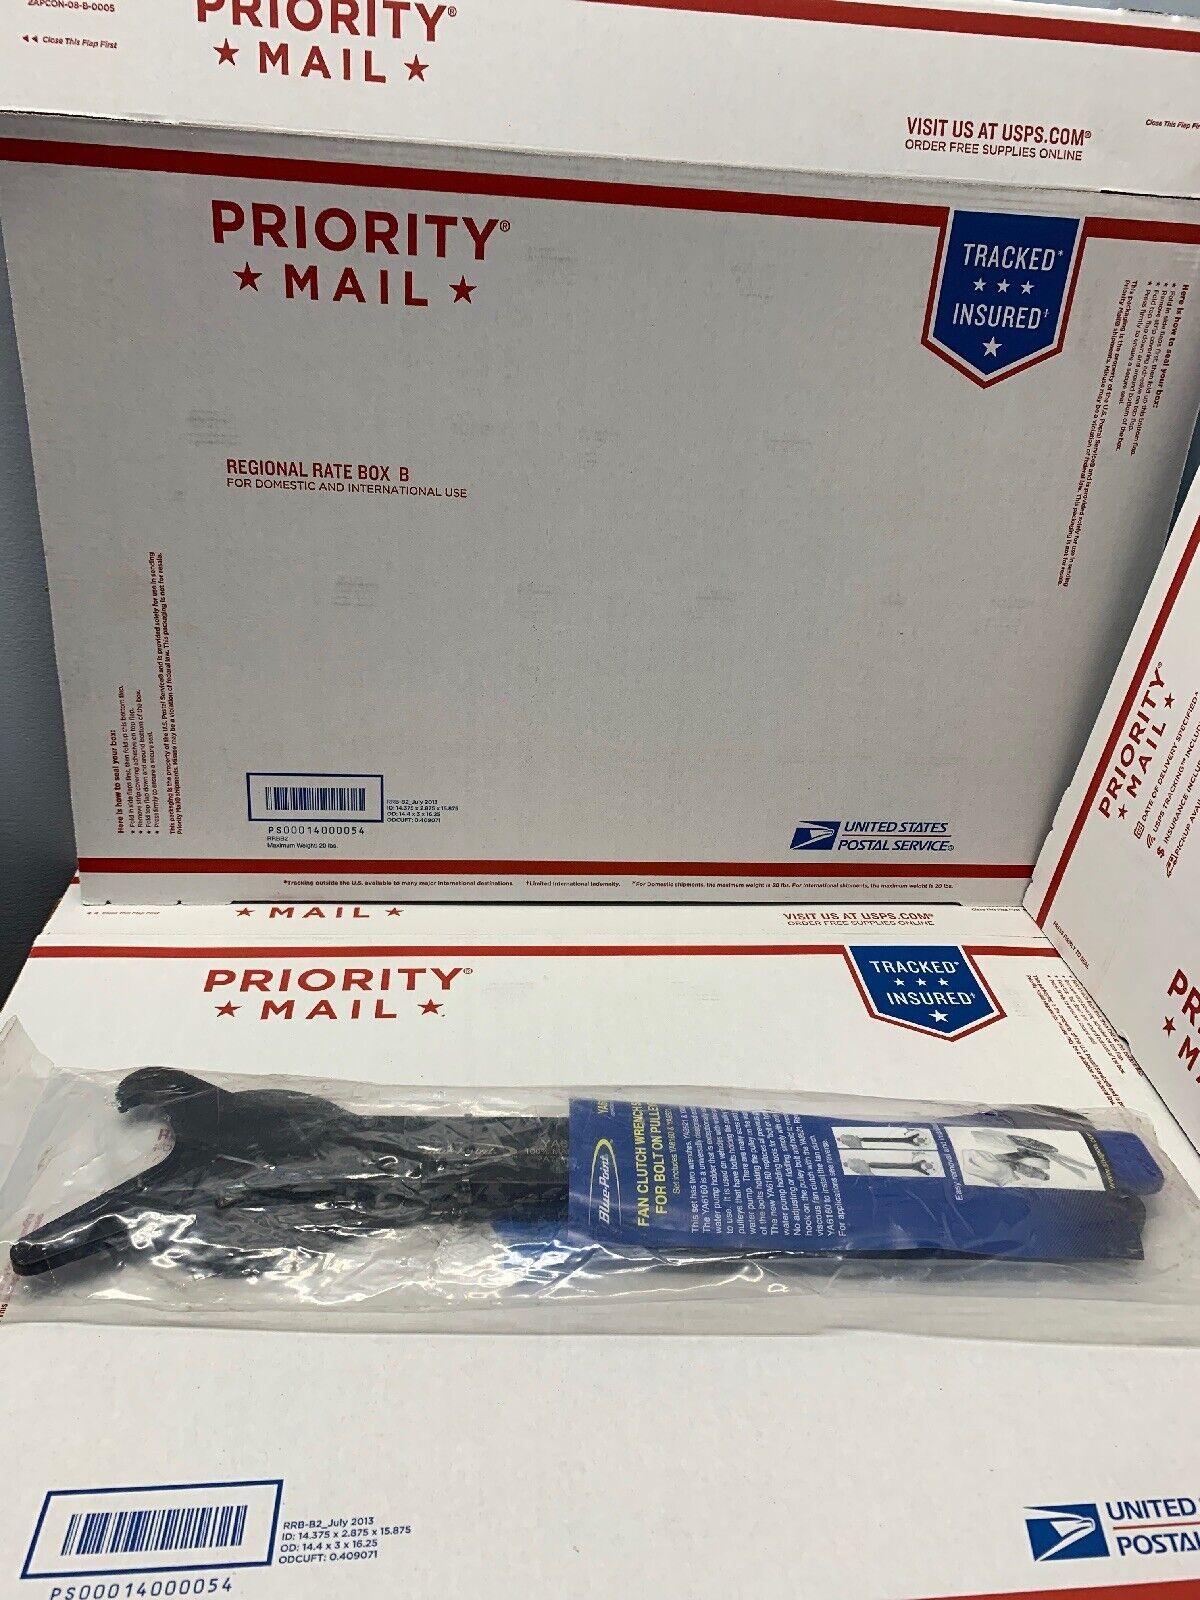 Blau Point 2pc Fan Clutch Wrench Set For Bolt On Pulleys YA6120 New